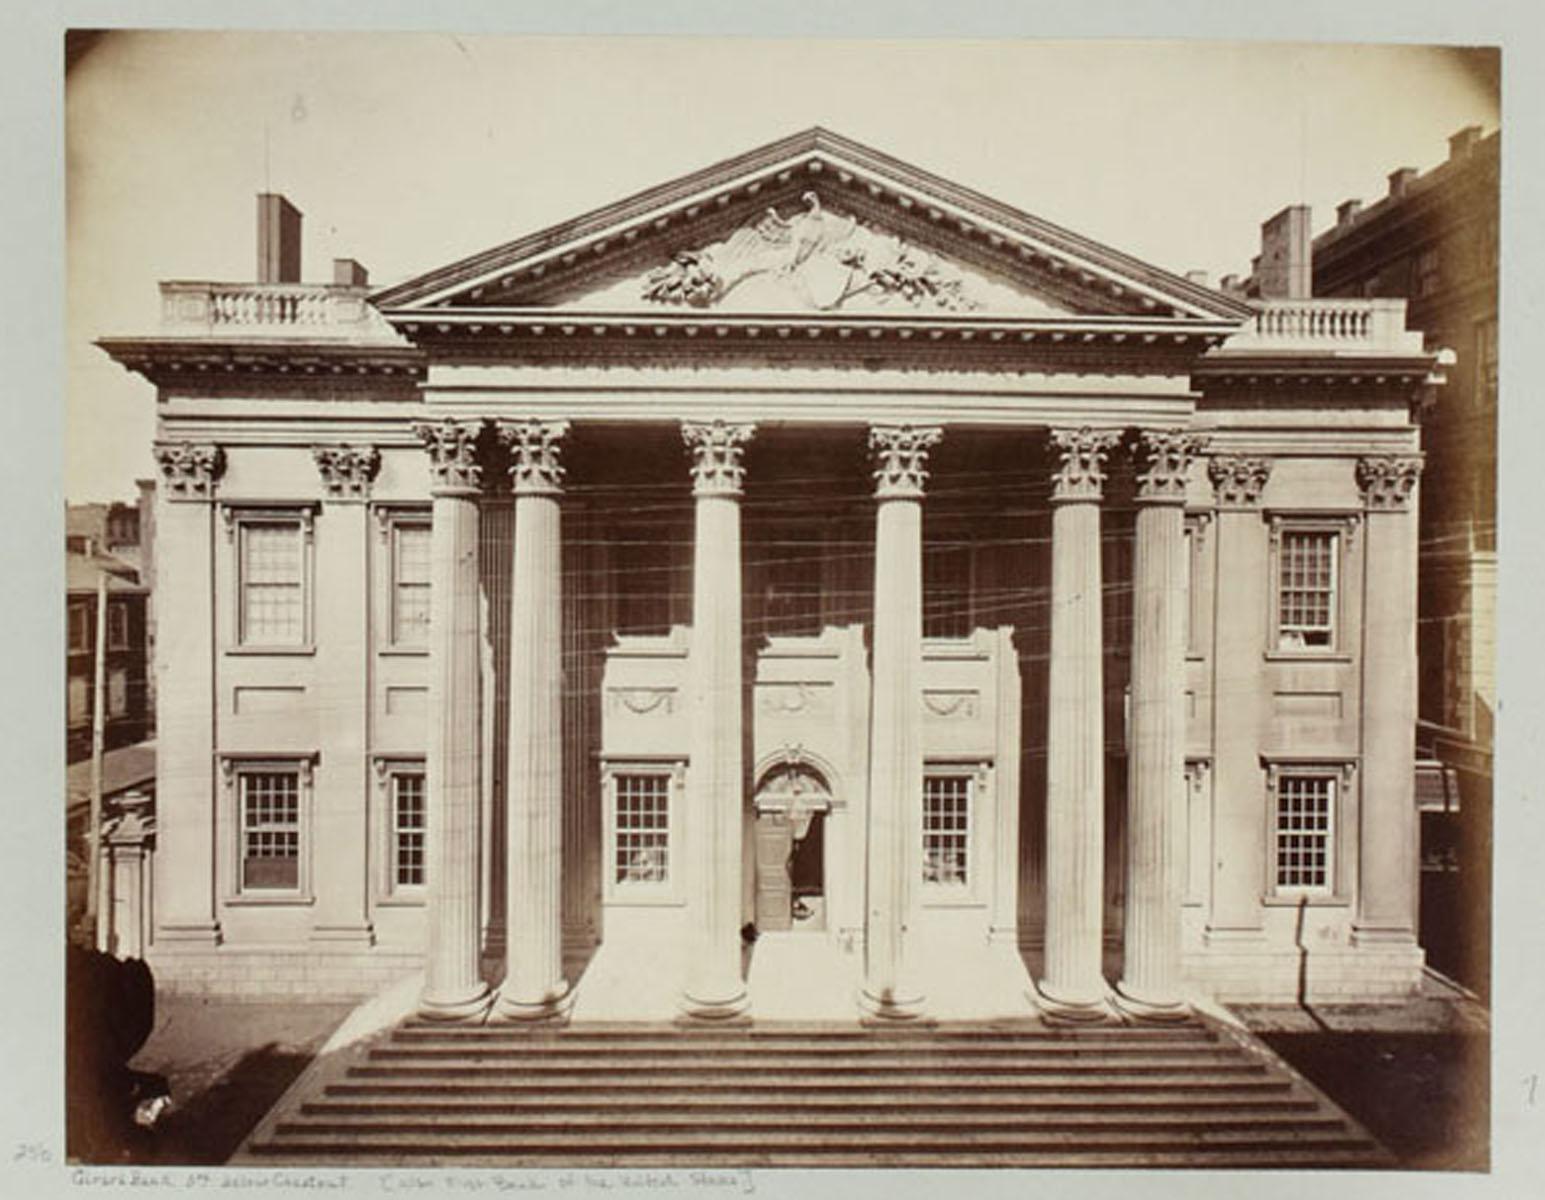 By Library Company of Philadelphia [No restrictions], via Wikimedia Commons